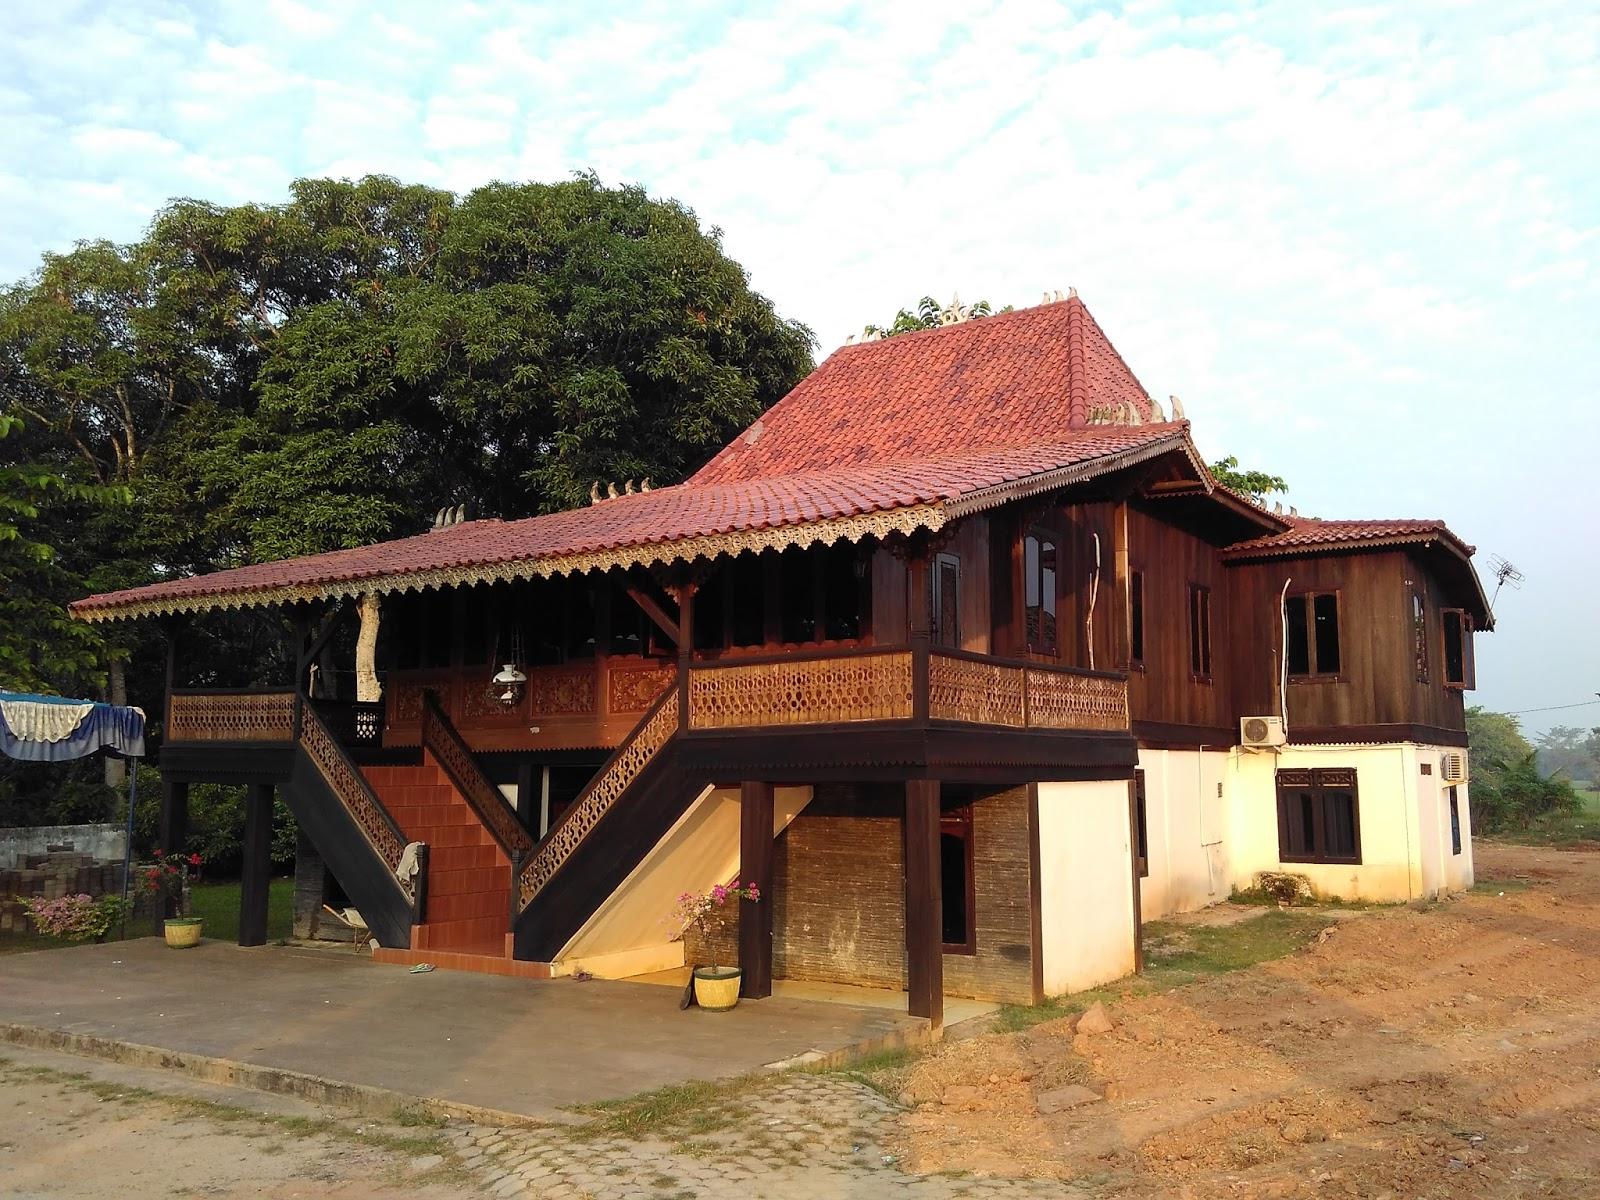 Palembang Bumi Sriwijaya Rumah Tradisional Limas Hattarajasa Desa Jejawi Ogan